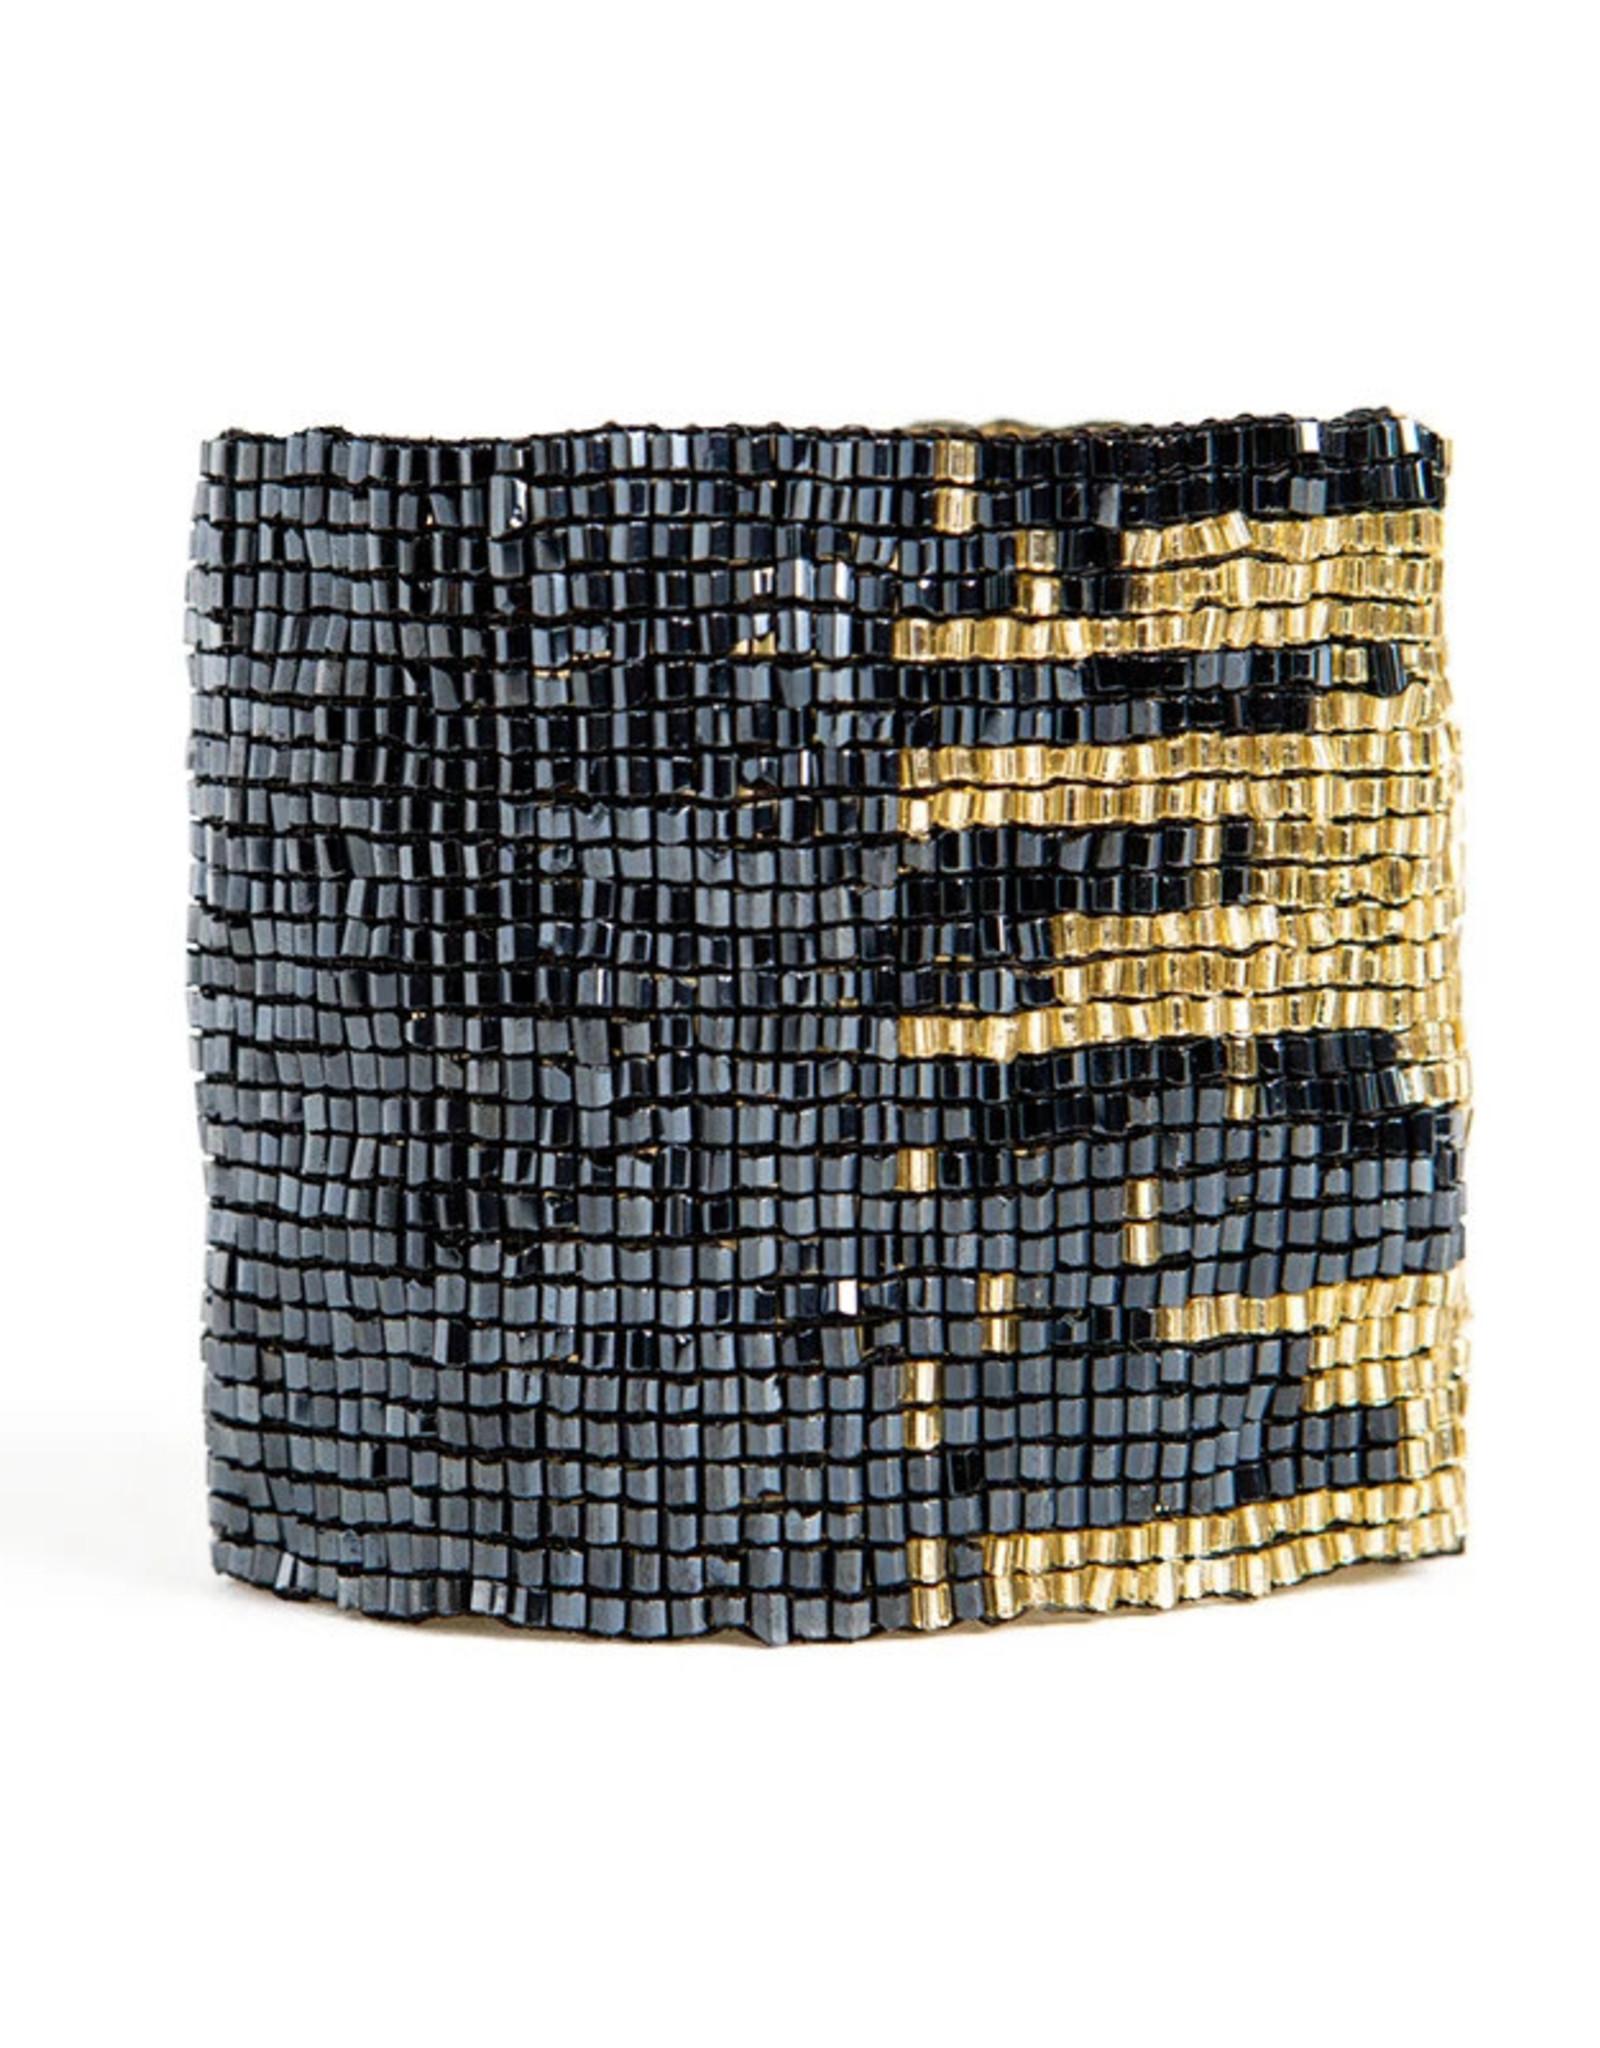 BRACELET BLUE AND GOLD STRETCH